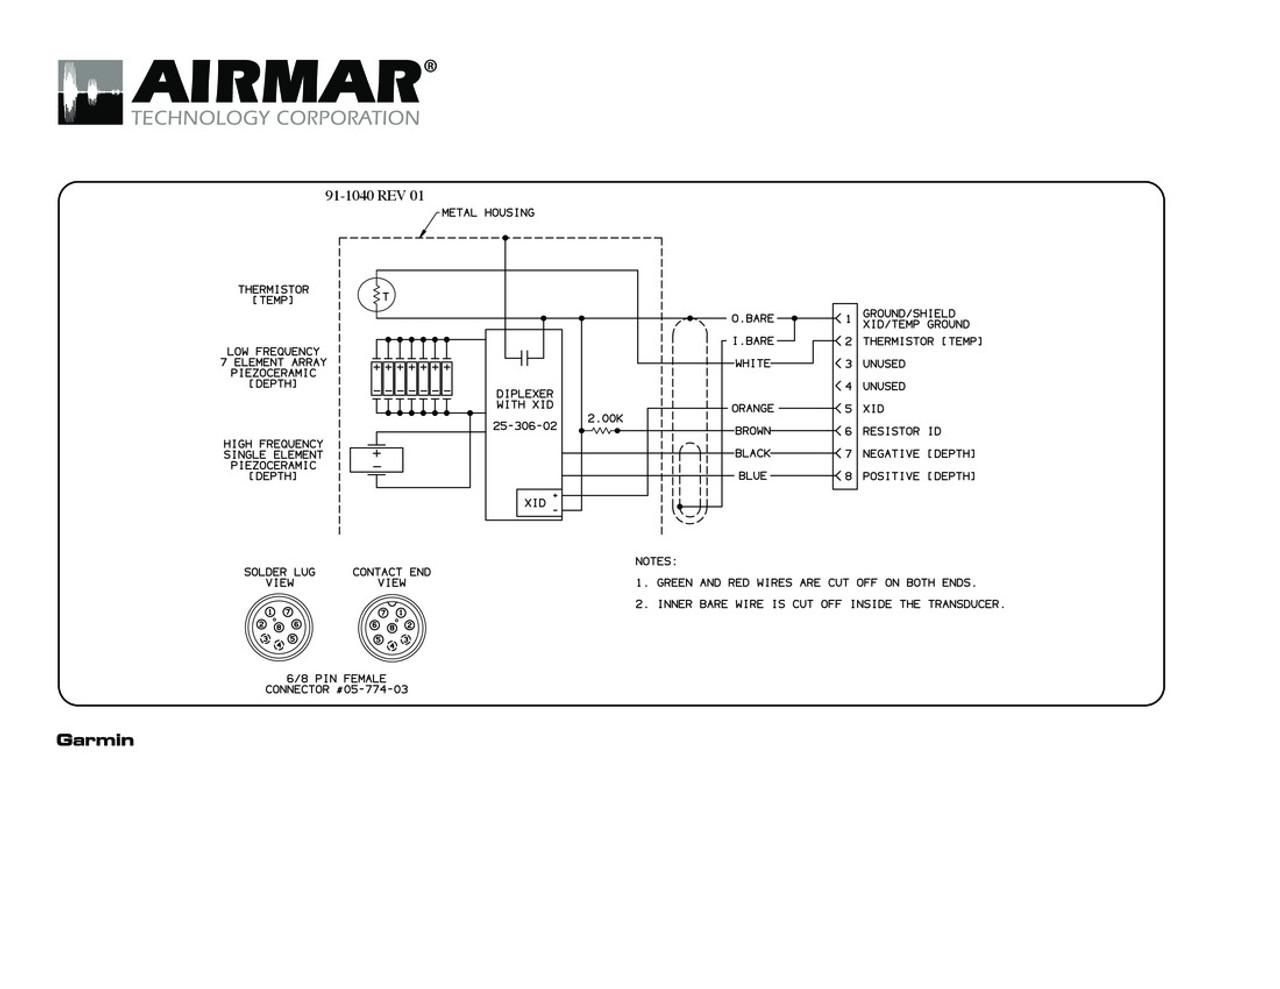 hight resolution of garmin 128 wiring diagram wiring diagram datasourcegarmin 128 wiring diagram manual e book garmin 128 wiring